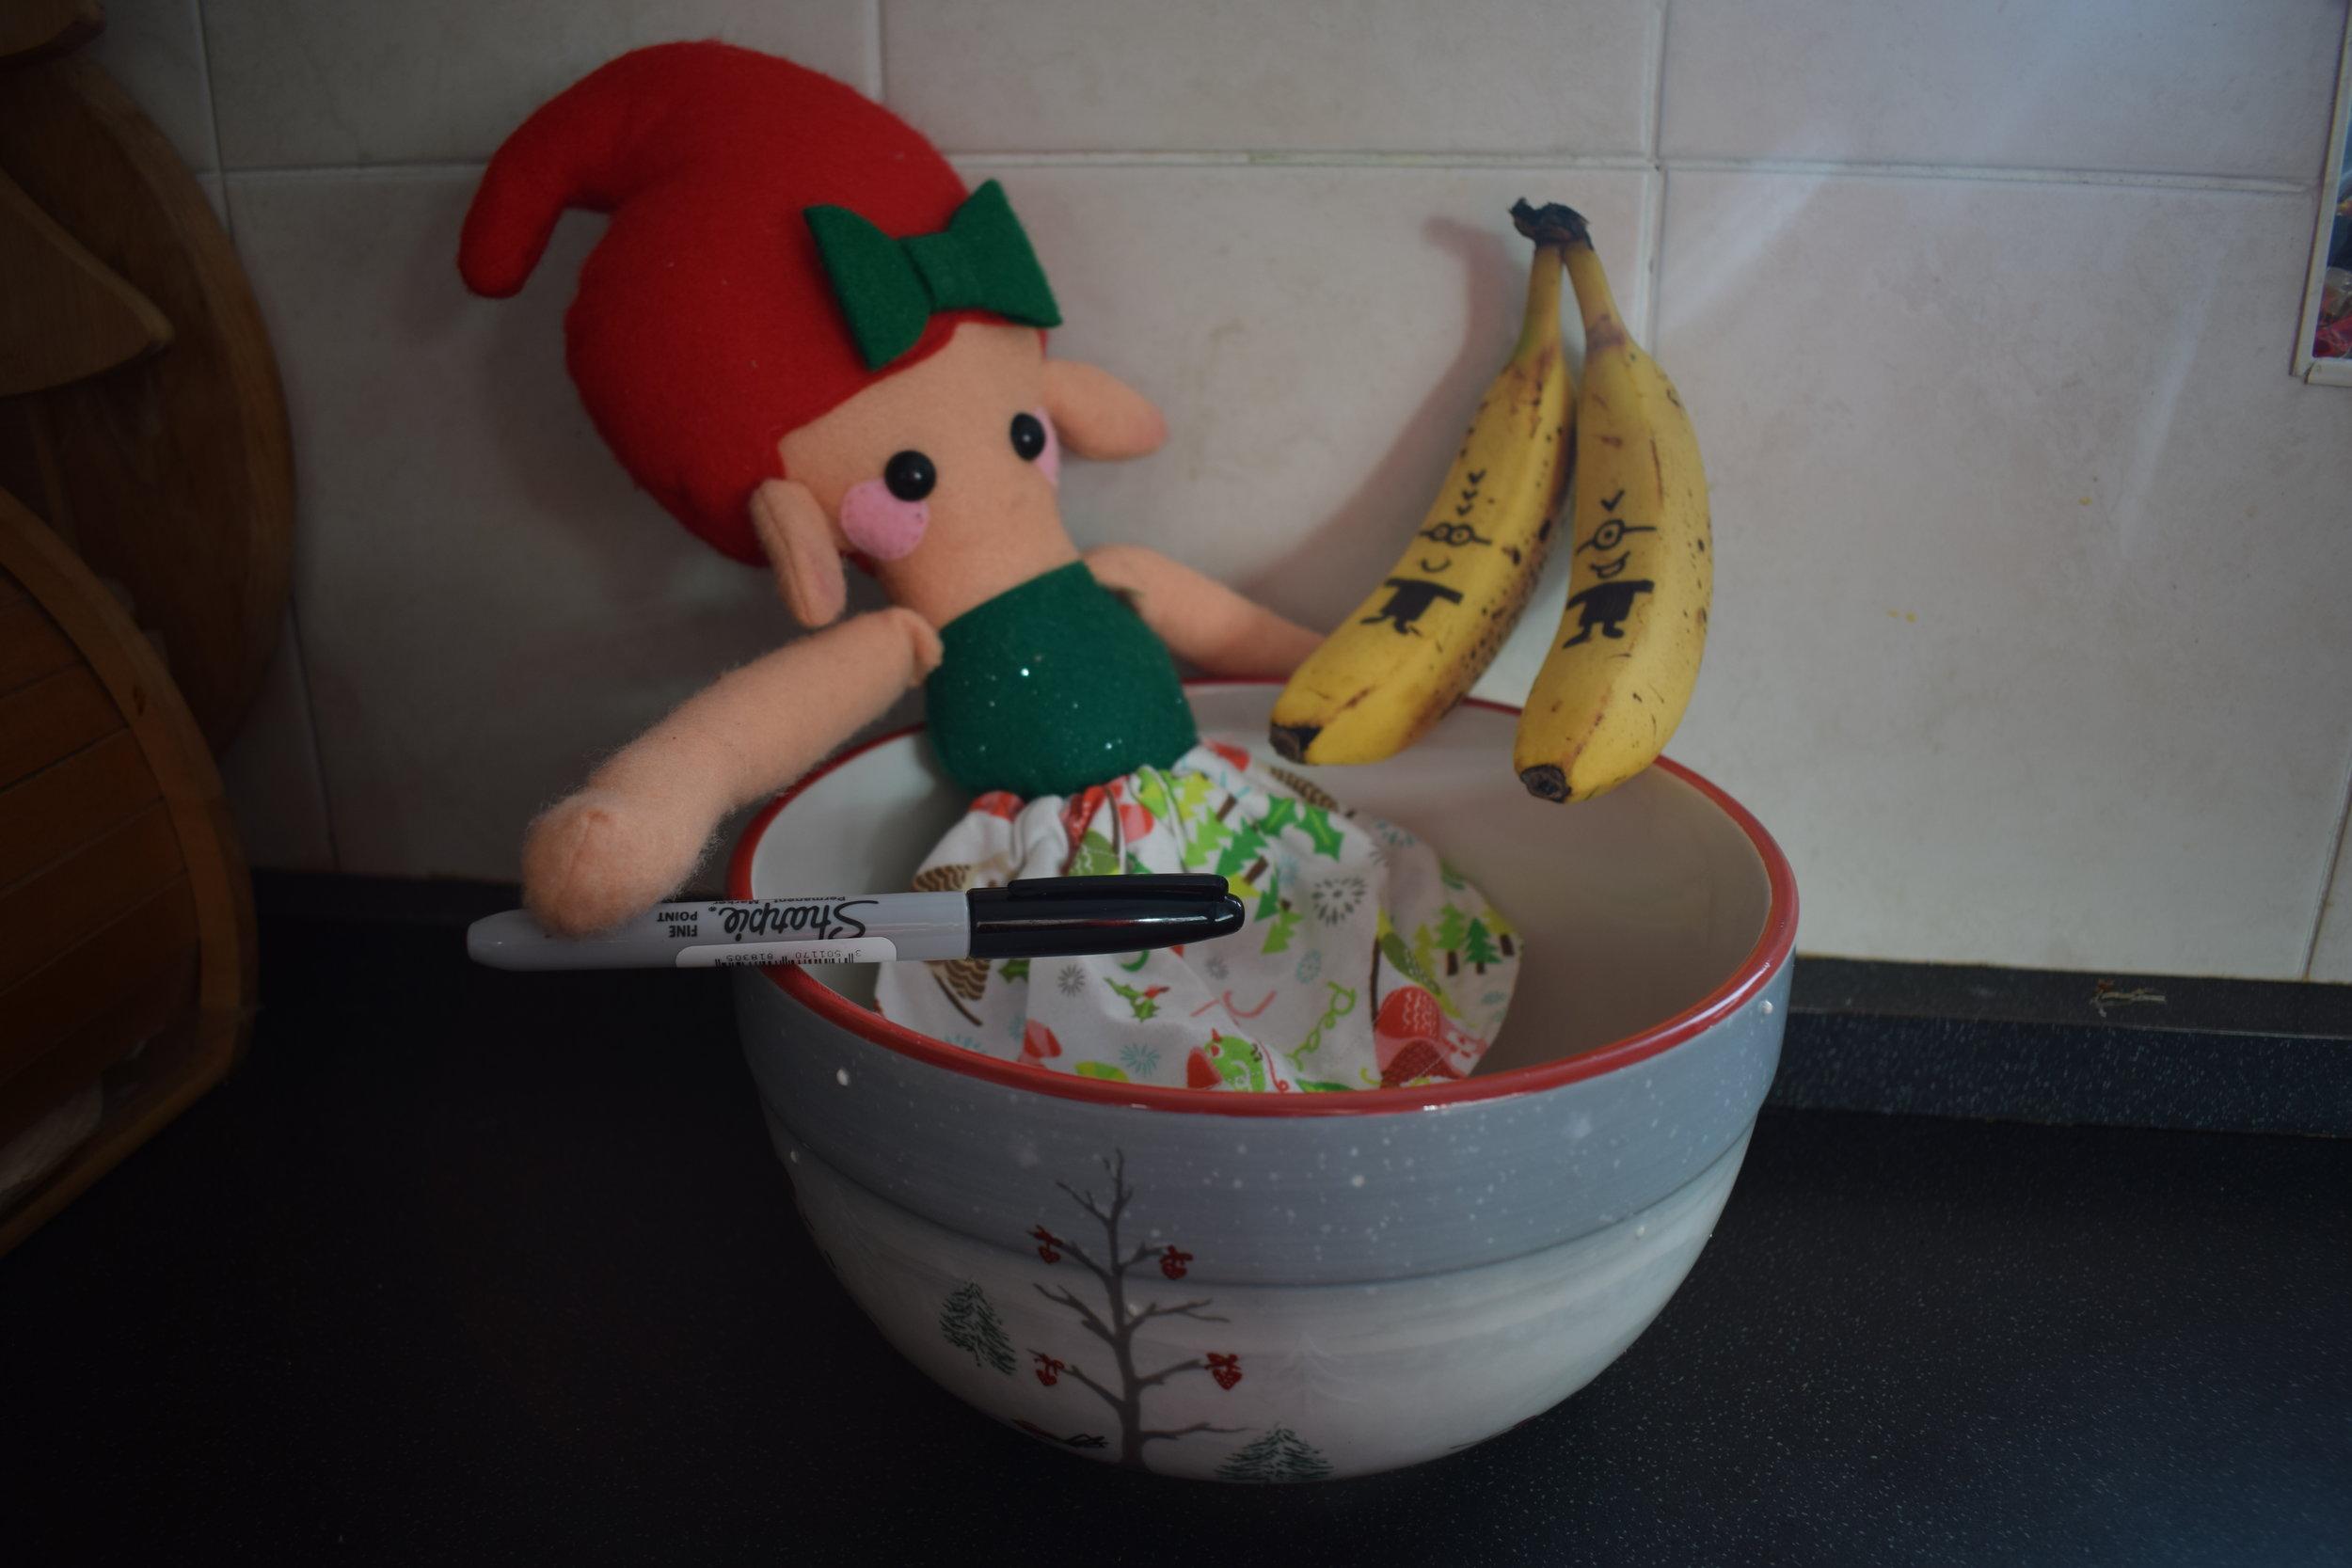 Elf on the Shelf Minion Bananas